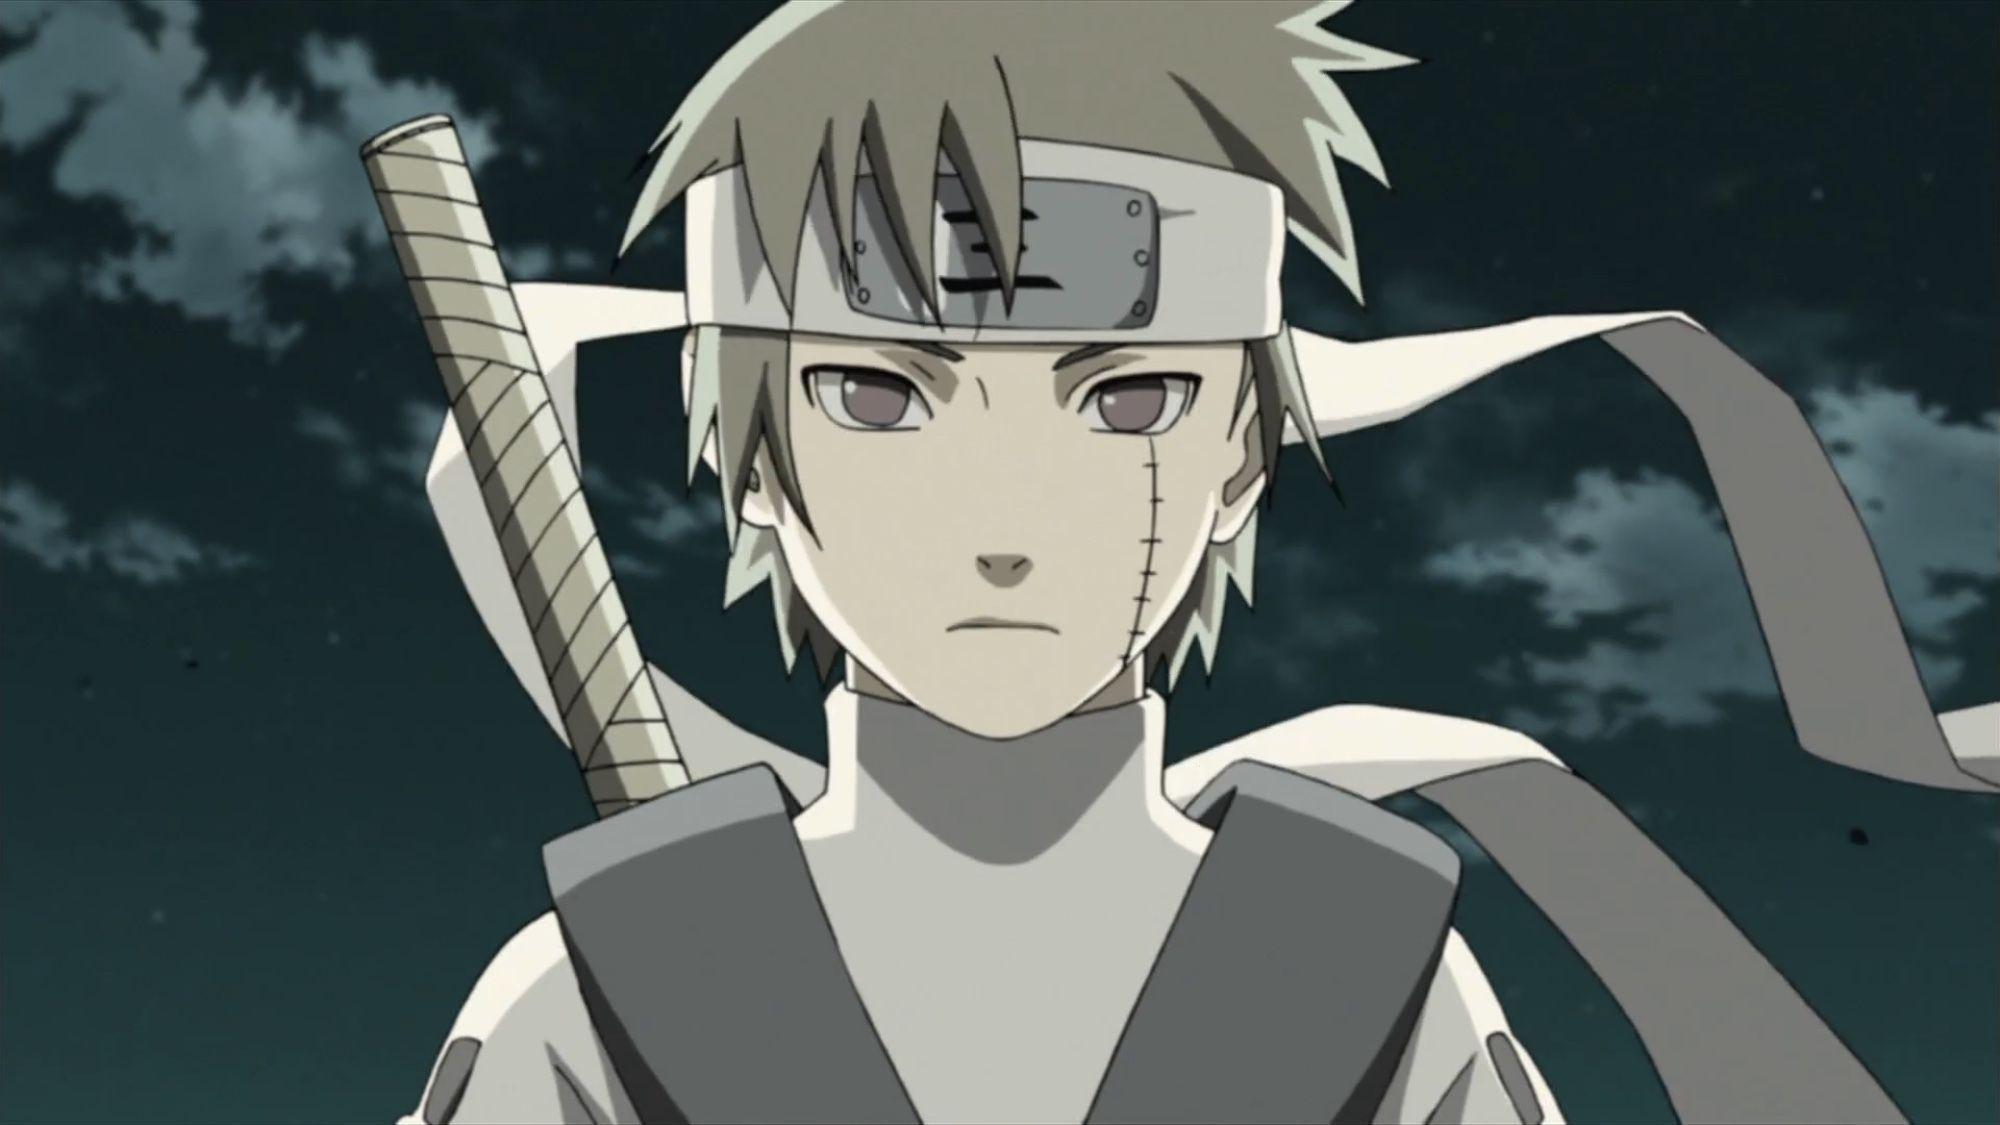 Yagura Naruto Wallpaper Anime Top Wallpaper